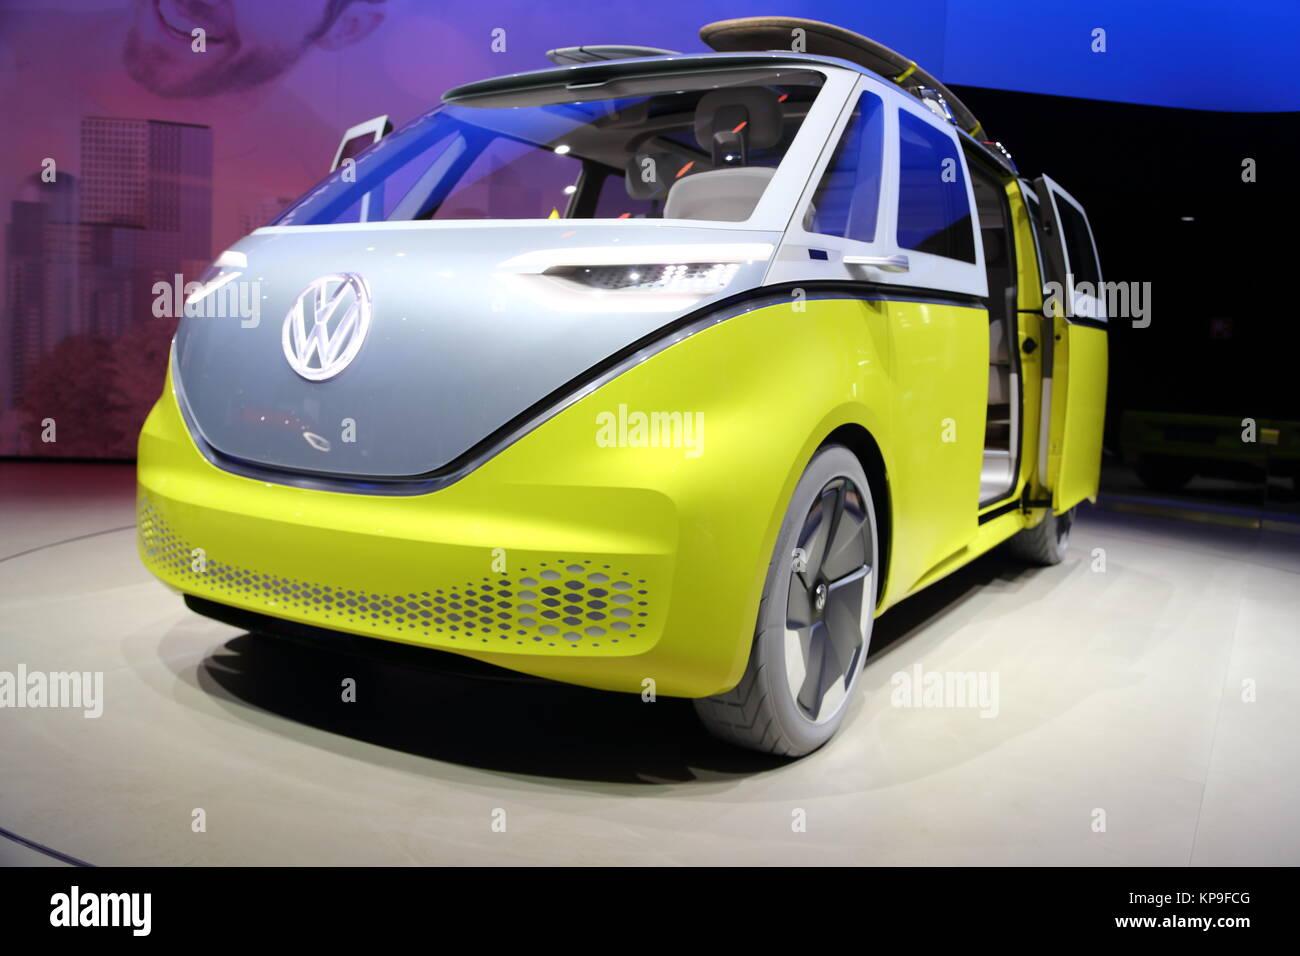 Volkswagen I.D. Buzz electric van at the Frankfurt International Motor Show 2017, Germany - Stock Image